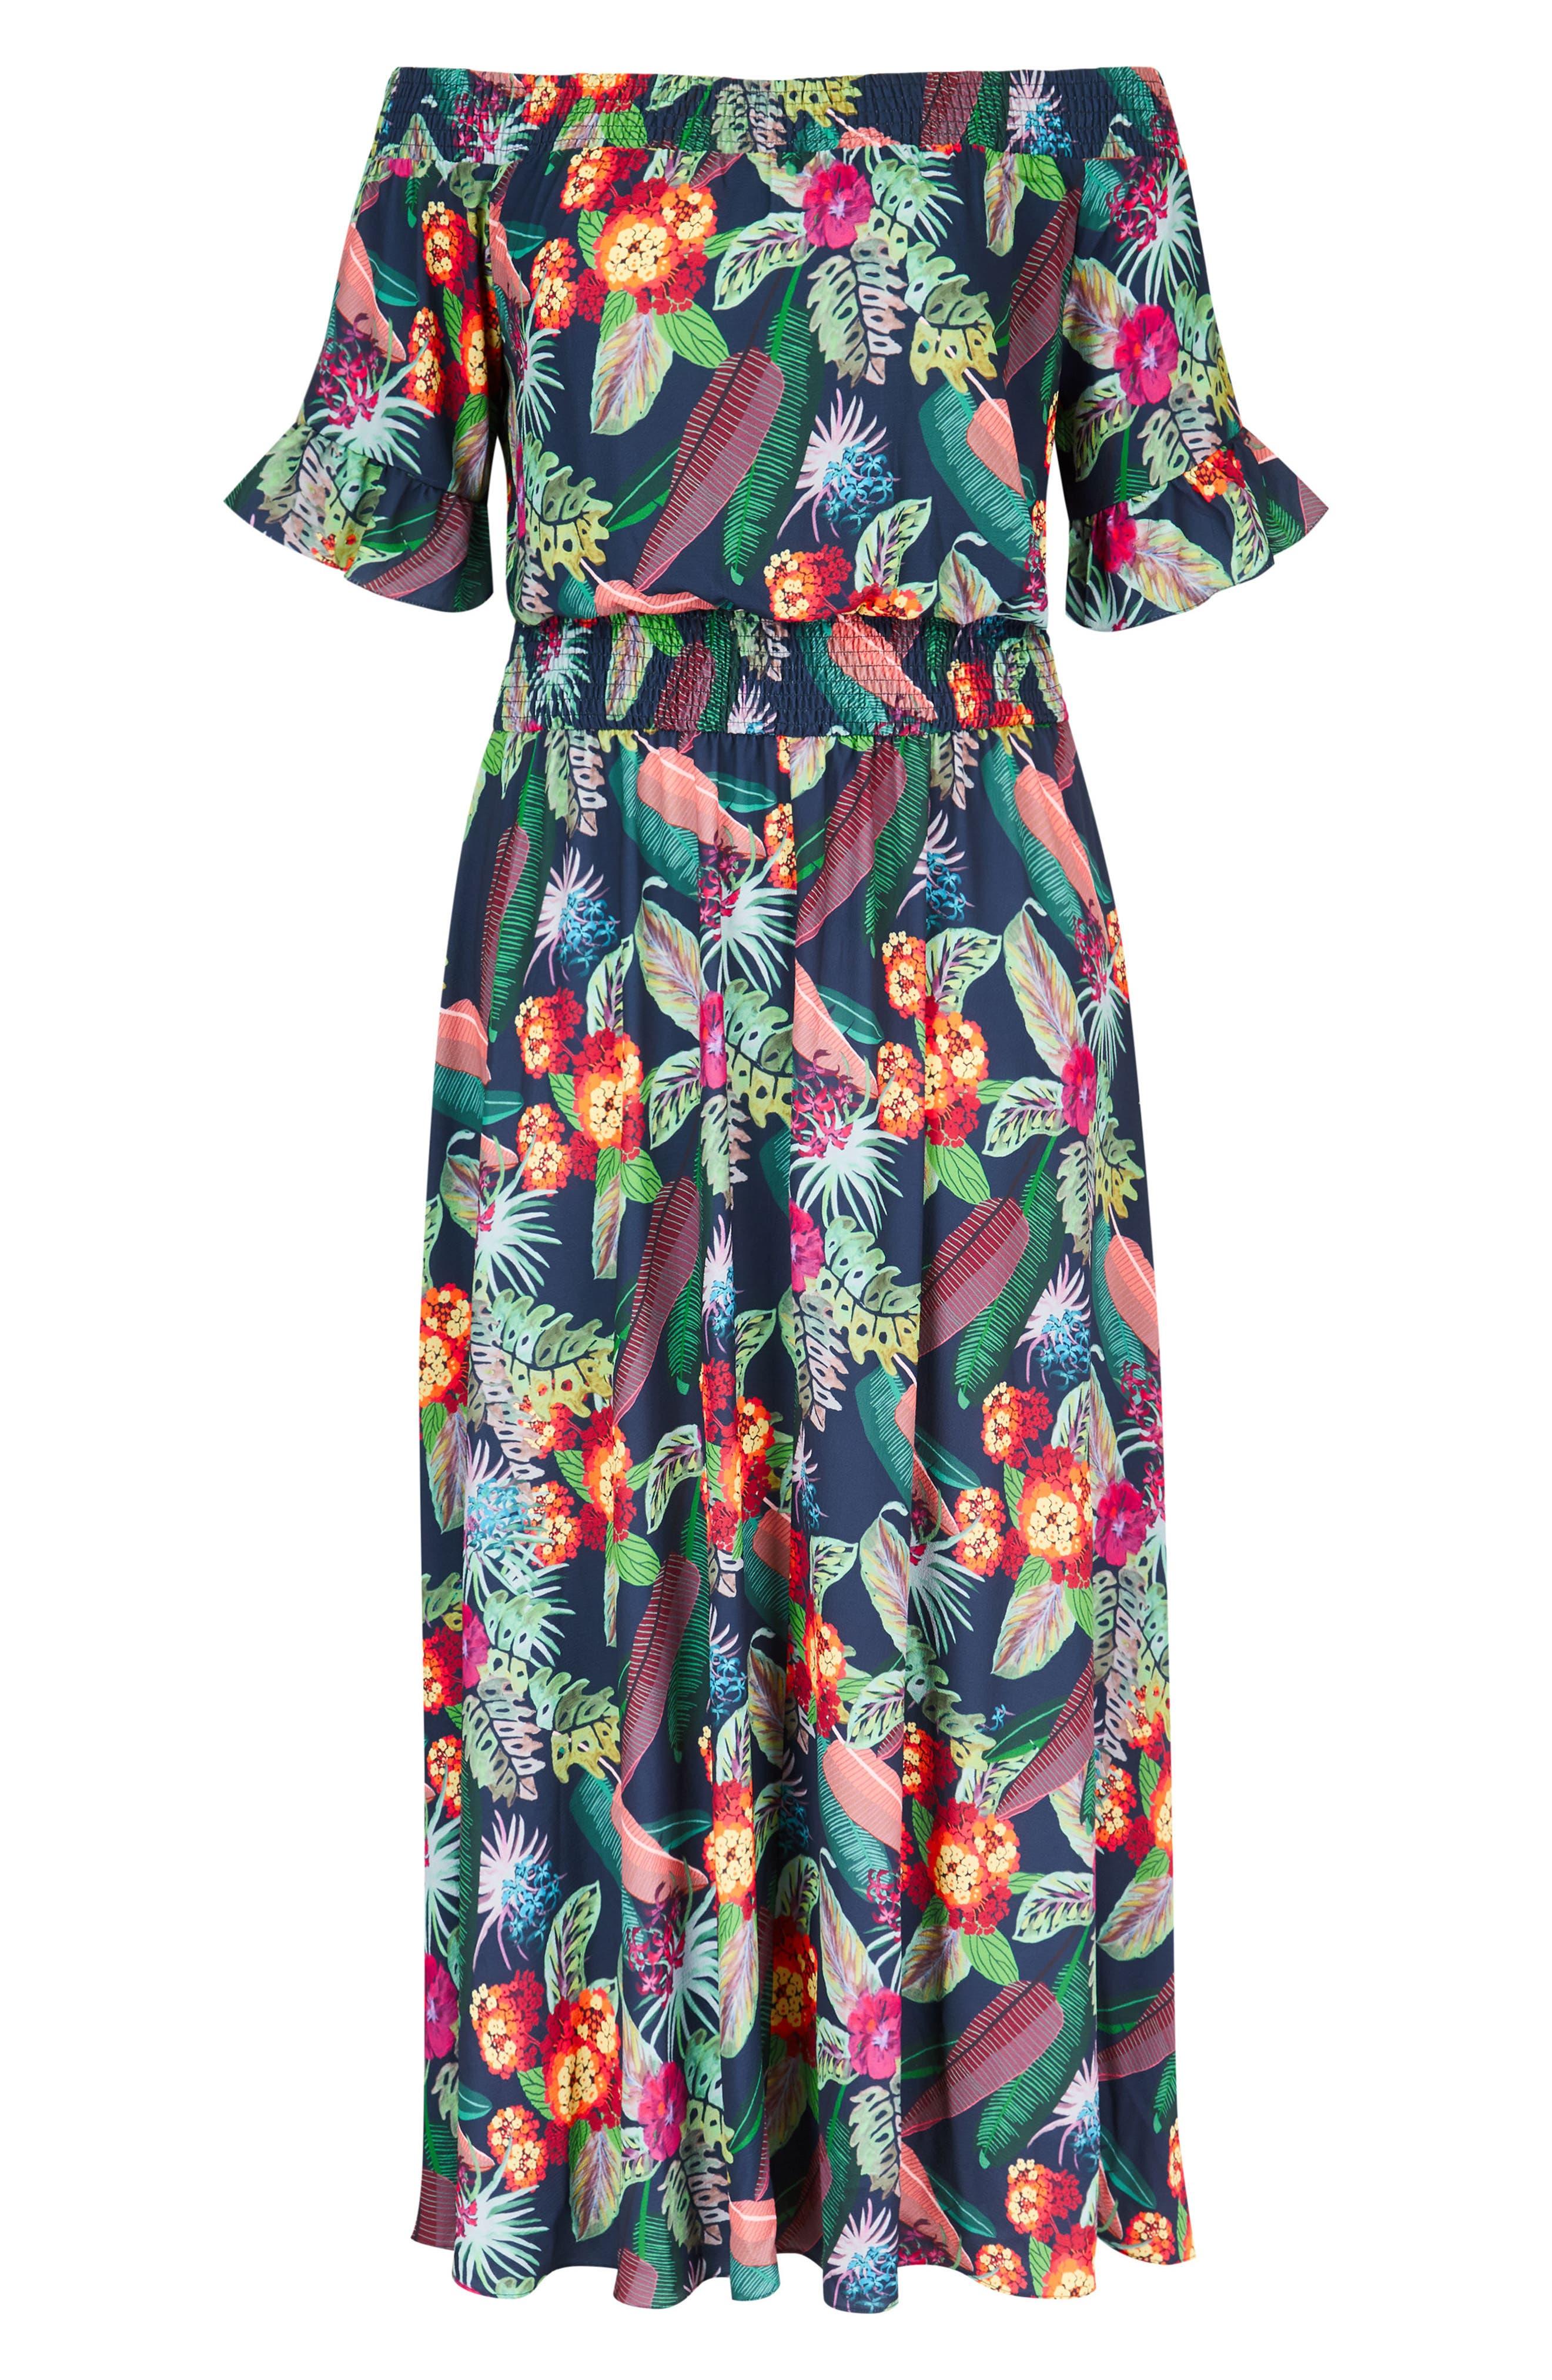 CITY CHIC,                             Jungle Jam Maxi Dress,                             Alternate thumbnail 3, color,                             415